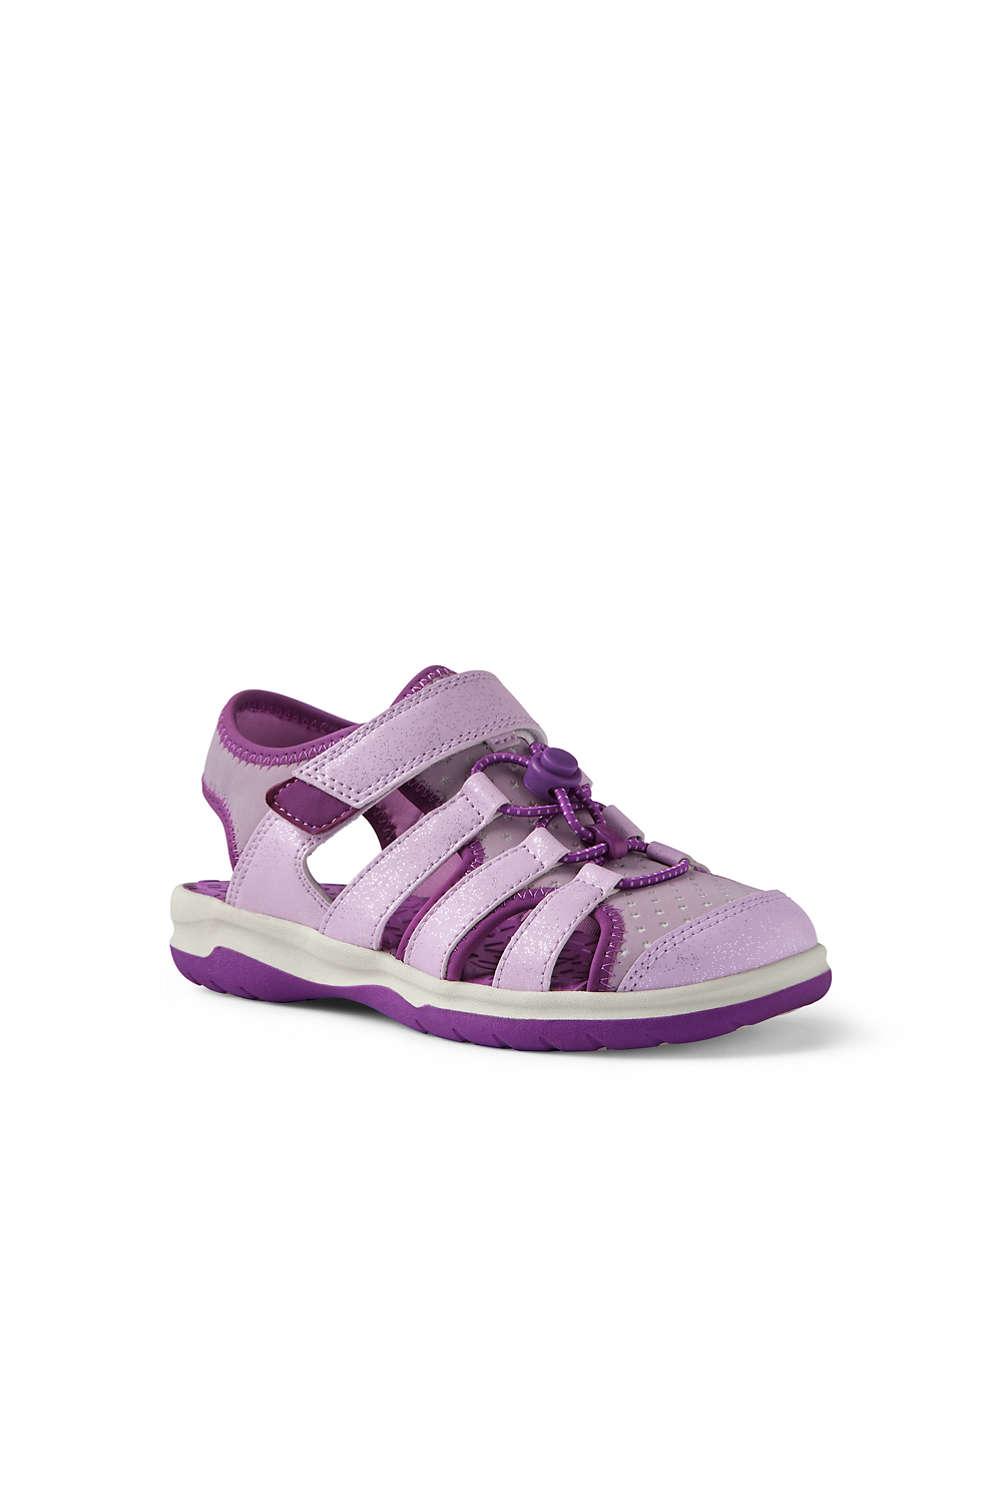 bf23010d1cb Kids Action Closed Toe Sandals. Item  4831676Q8. View Fullscreen